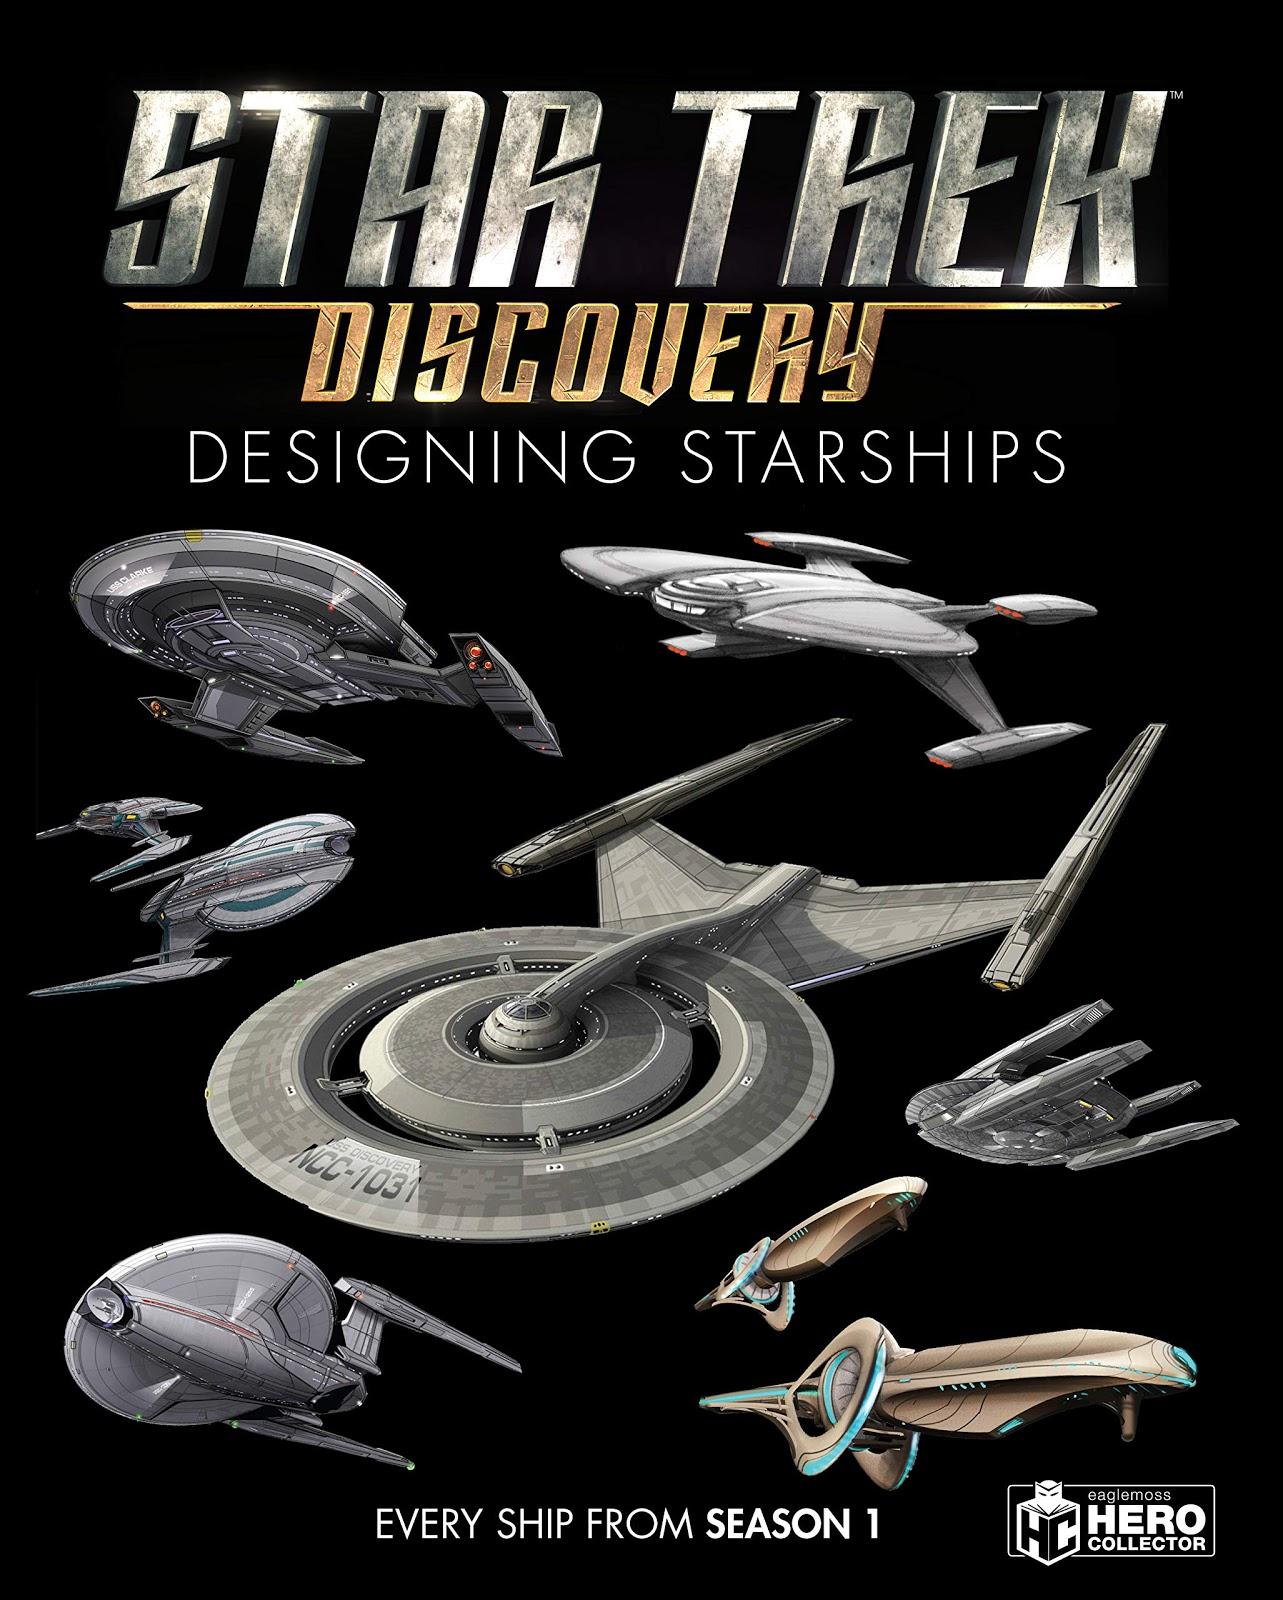 The Trek Collective New Eaglemoss Starships Books Revealed,Simple Wedding Cupcake Designs